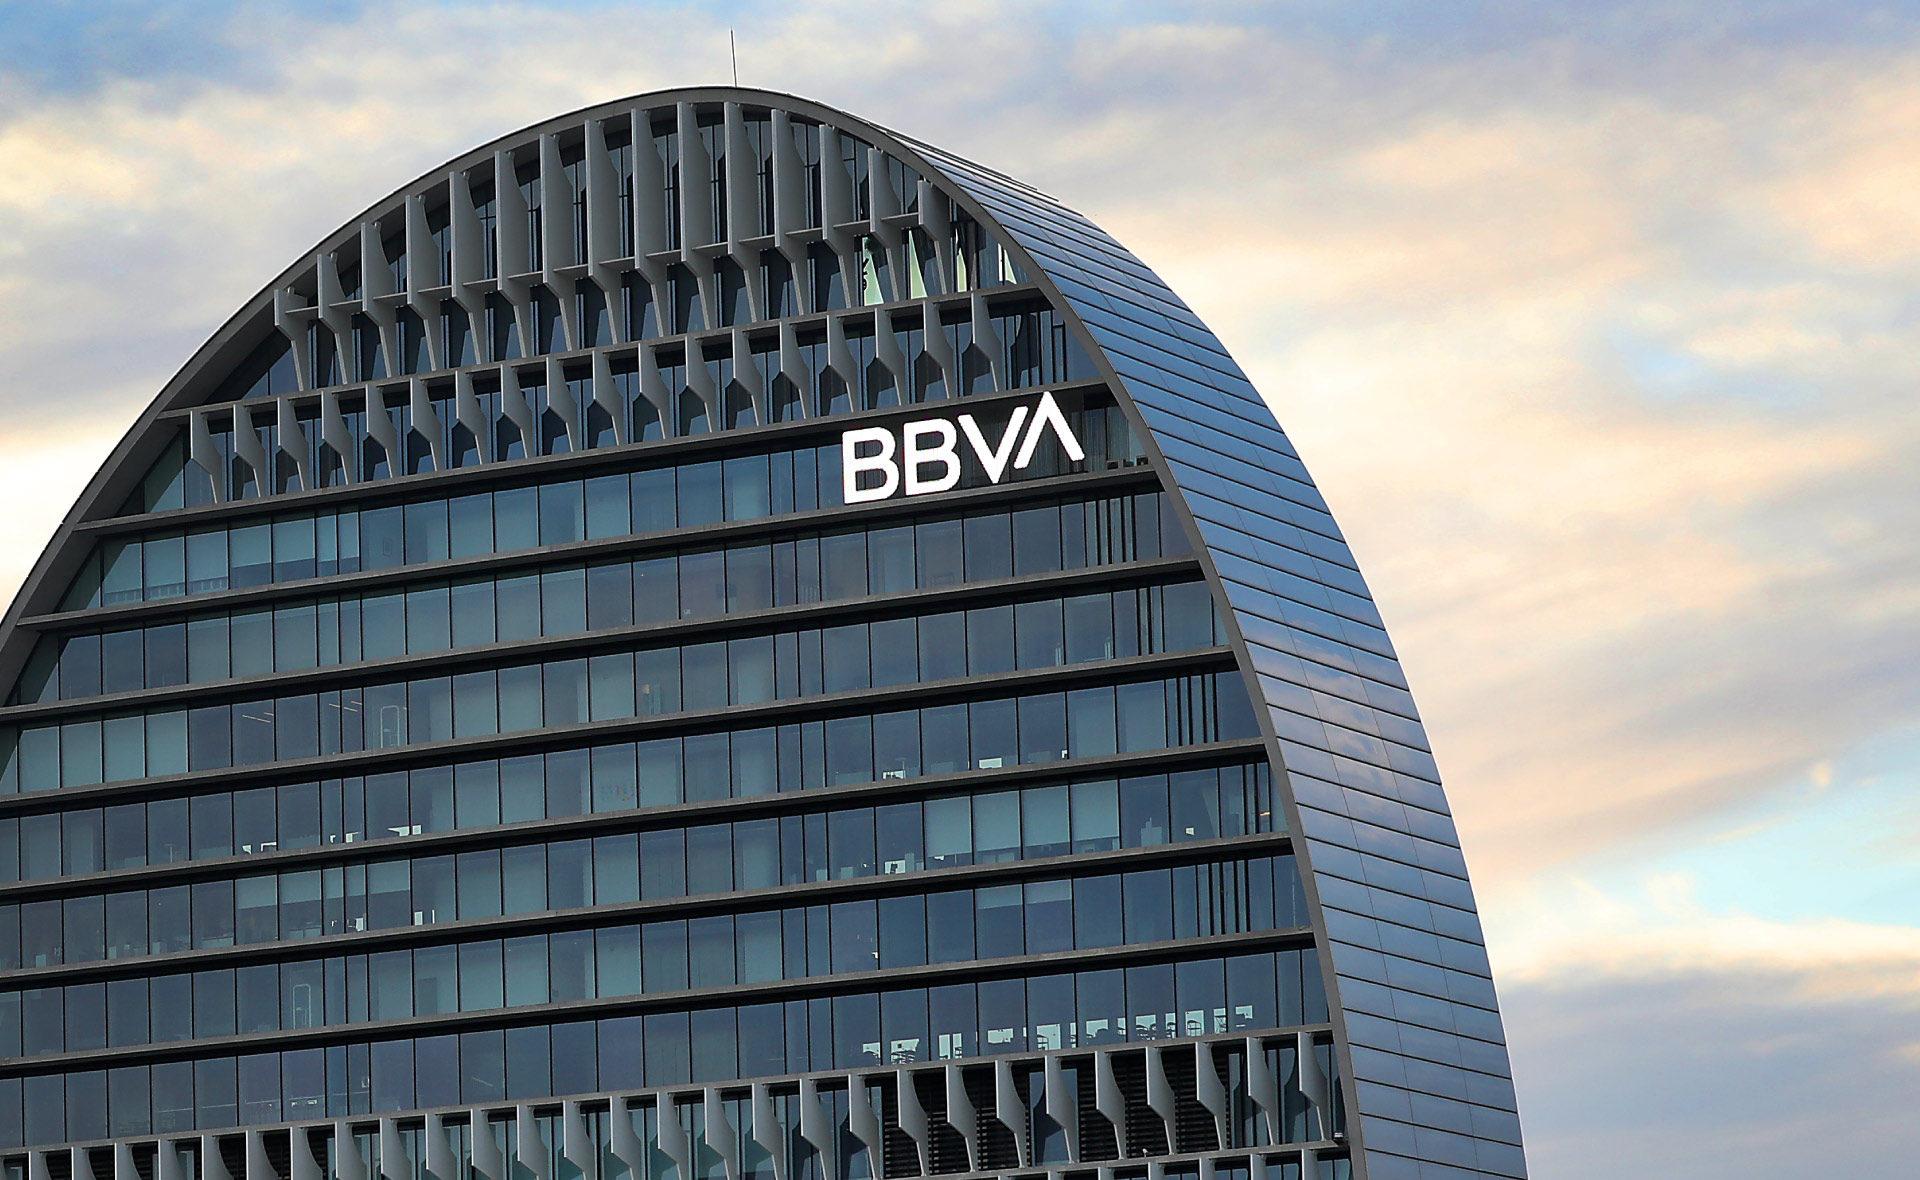 https://accionistaseinversores.bbva.com/wp-content/uploads/2020/04/La-Vela-imagen-ciudad-1920x1180.jpg